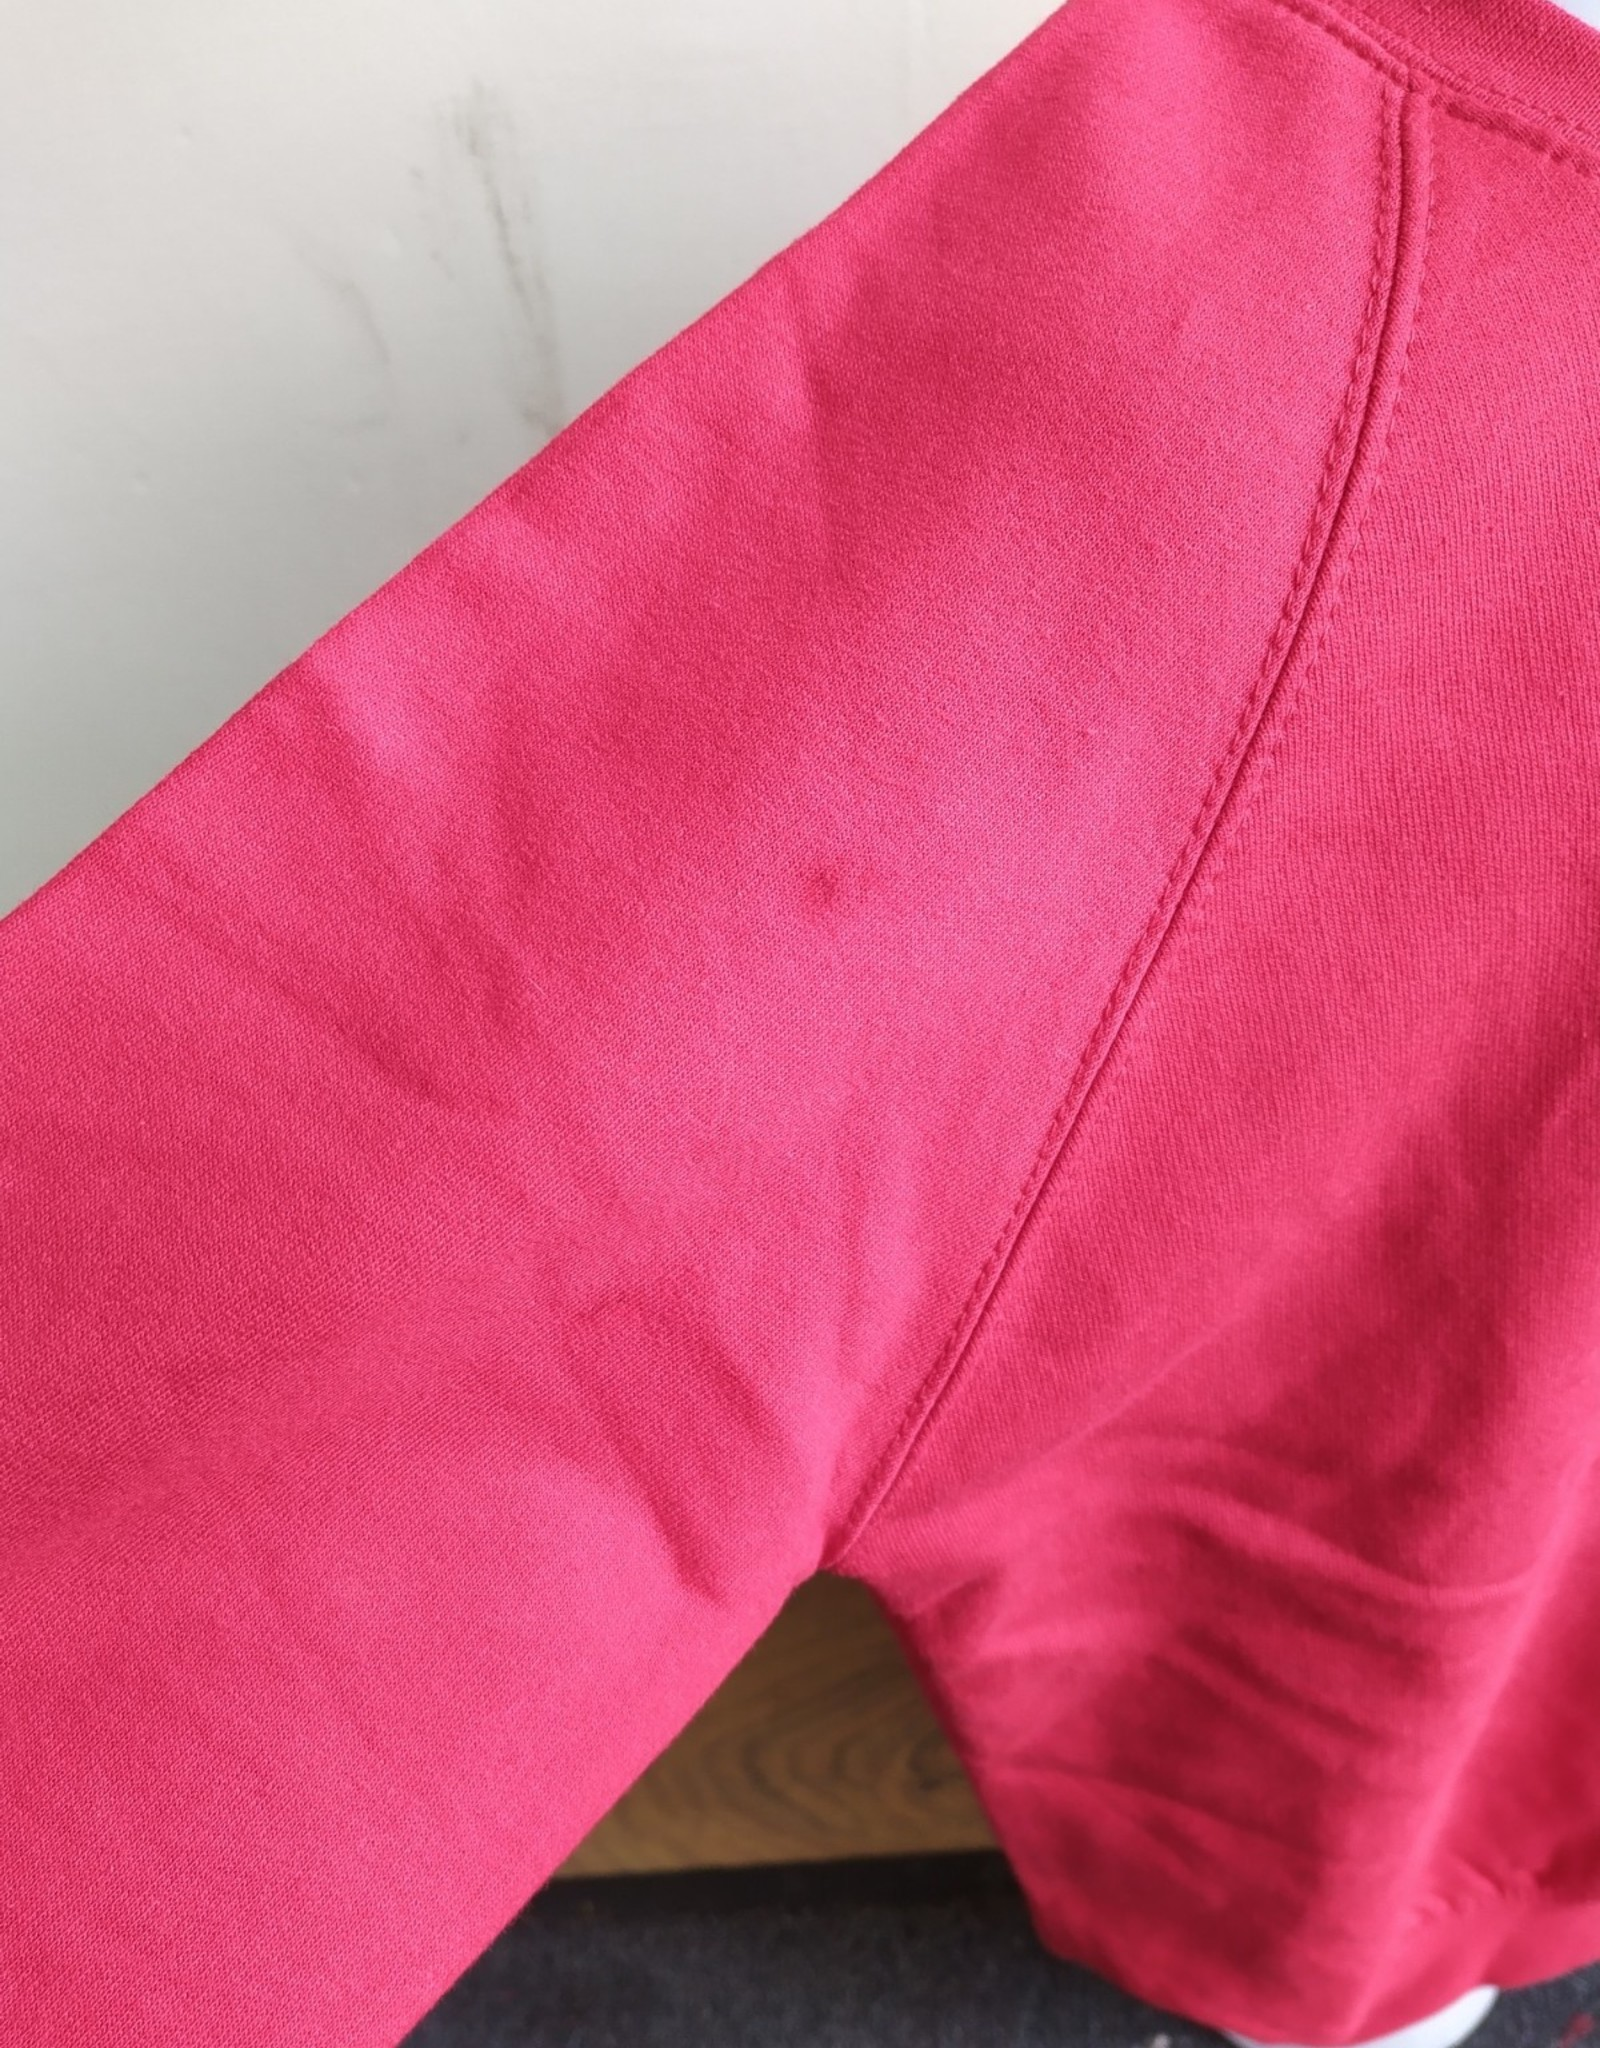 SALE ITEM Goodyers End Sweatshirt 9-10 A